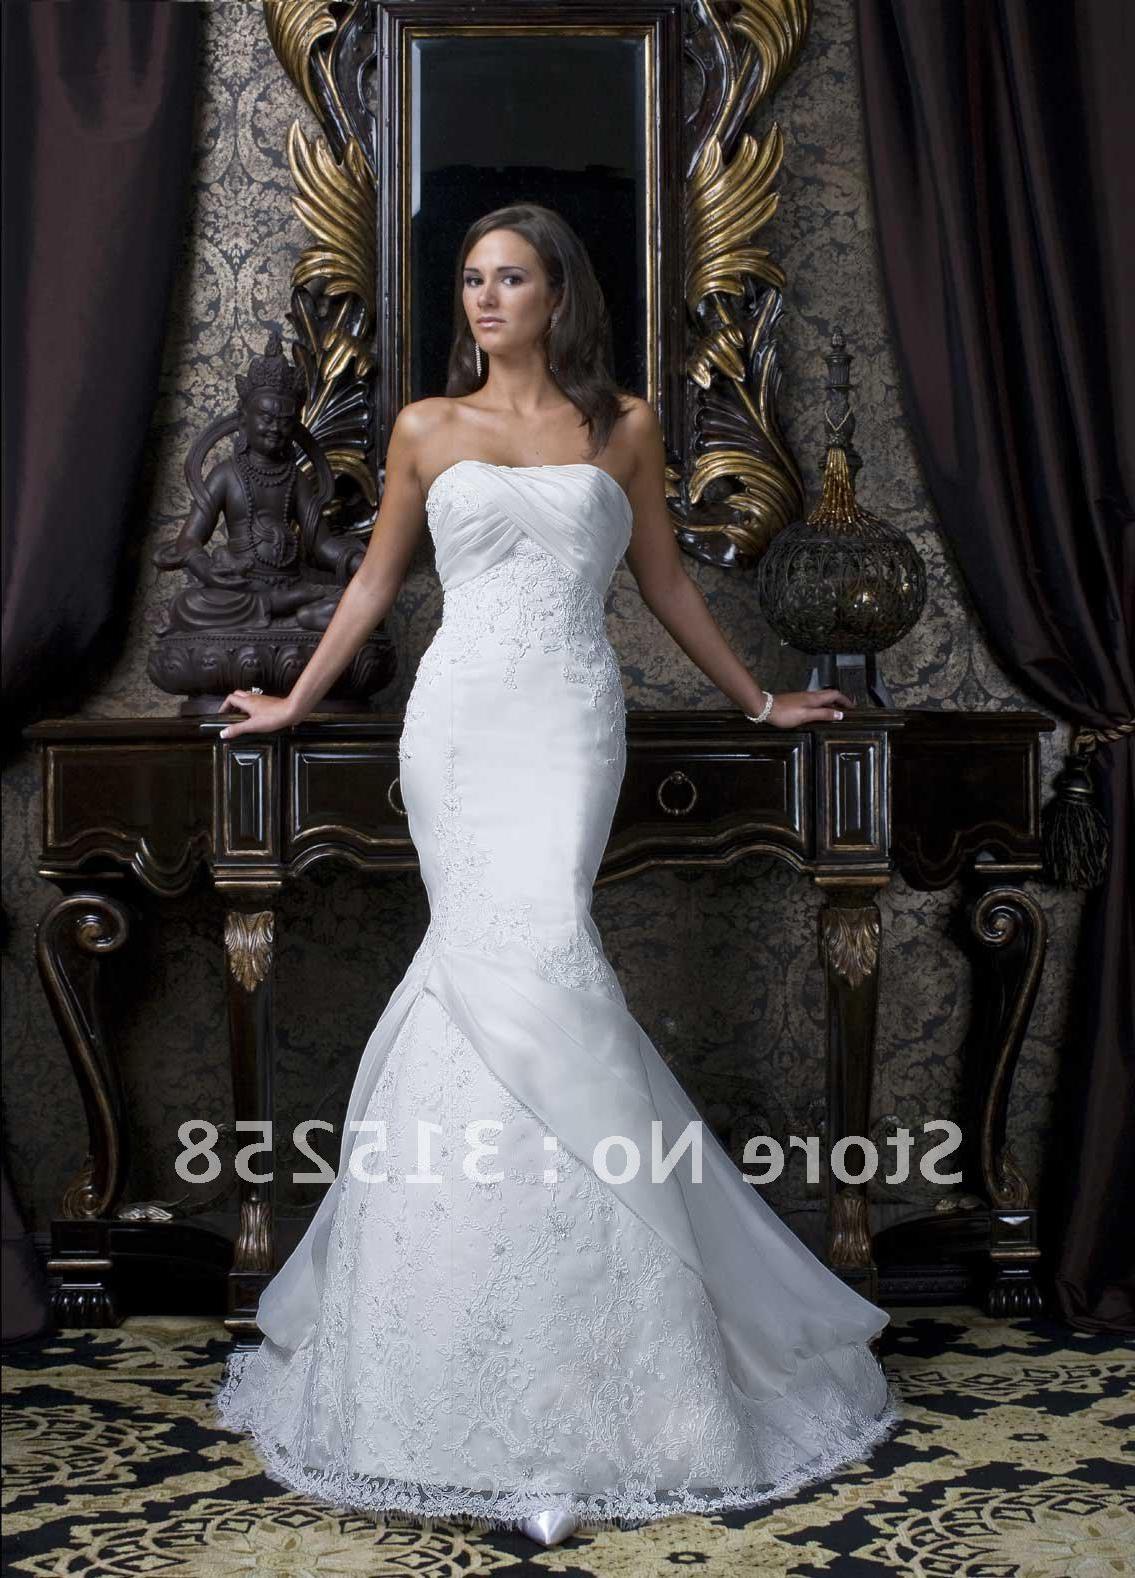 Wholesale Promotion New Fashion Trumpet Mermaid Bateau Lace Wedding Dresses